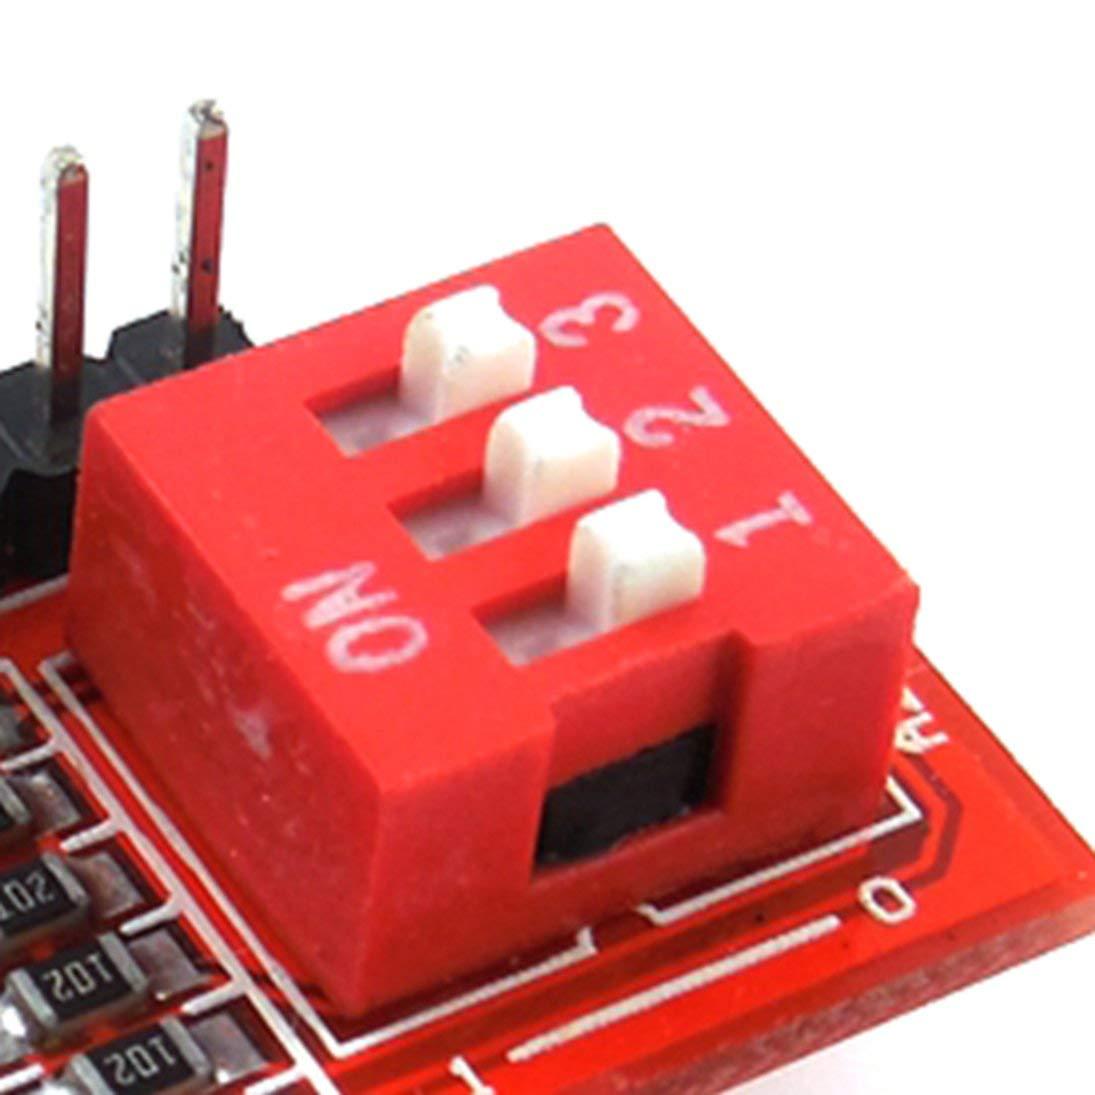 HW-400 M/ódulo de expansi/ón IO M/ódulo PCF8574T para Arduino ToGames-ES